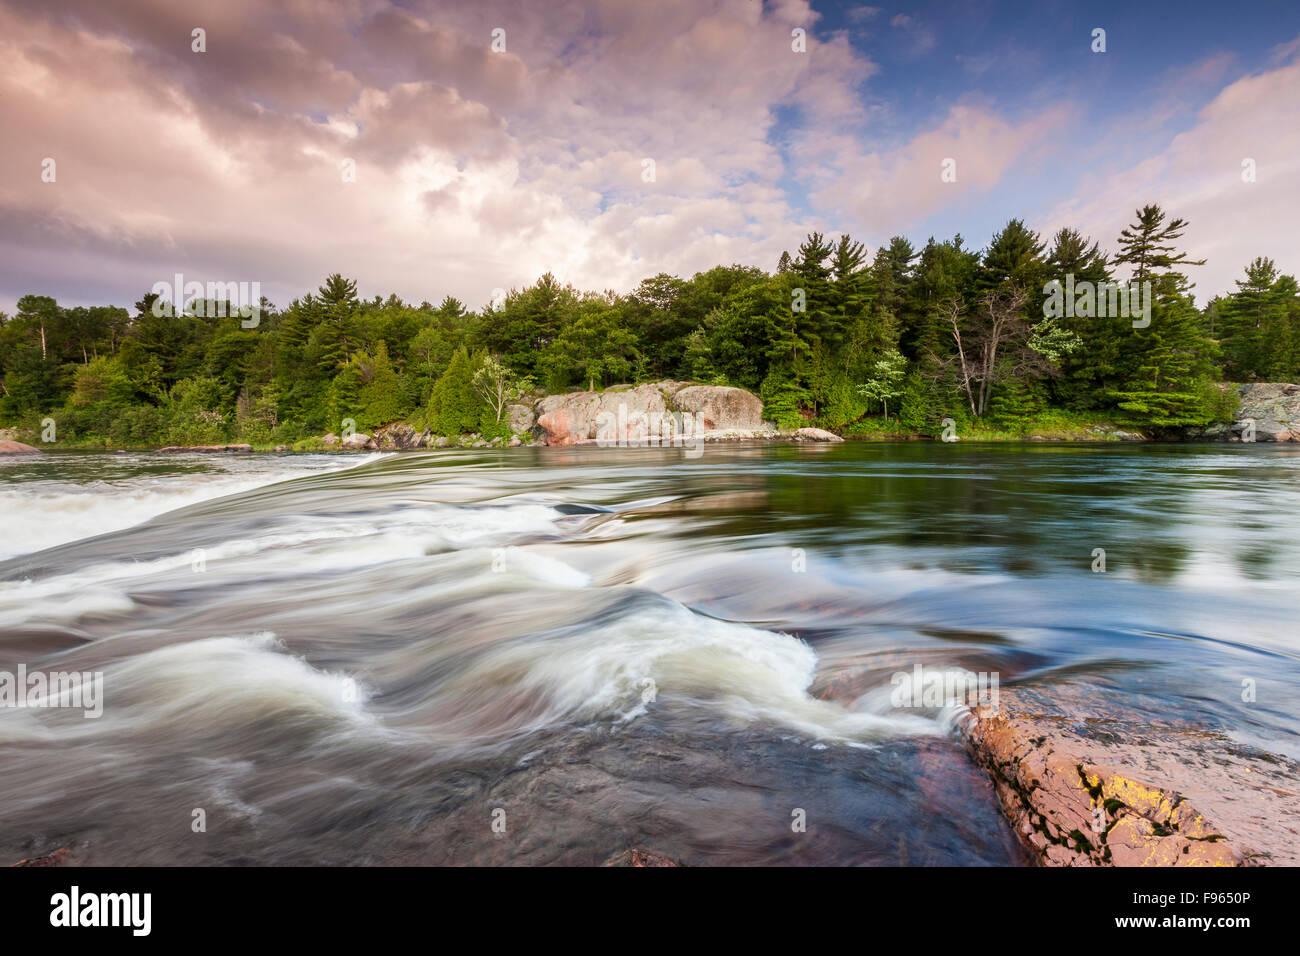 Mississagi River, Algoma District, Ontario, Canada - Stock Image